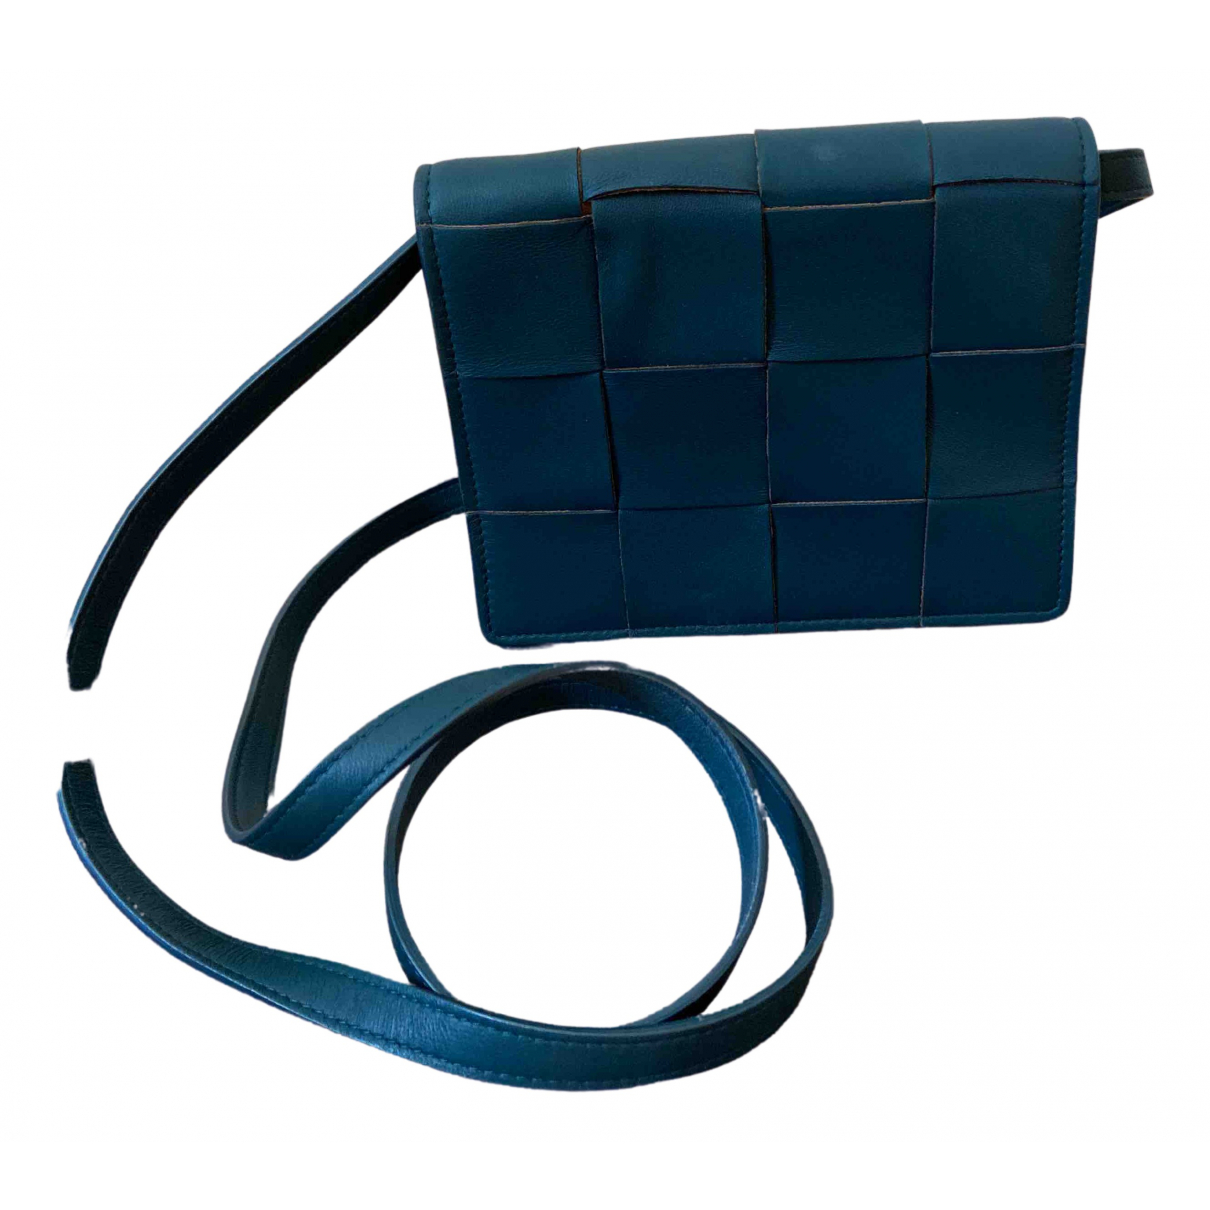 Bottega Veneta - Sac a main Cassette pour femme en cuir